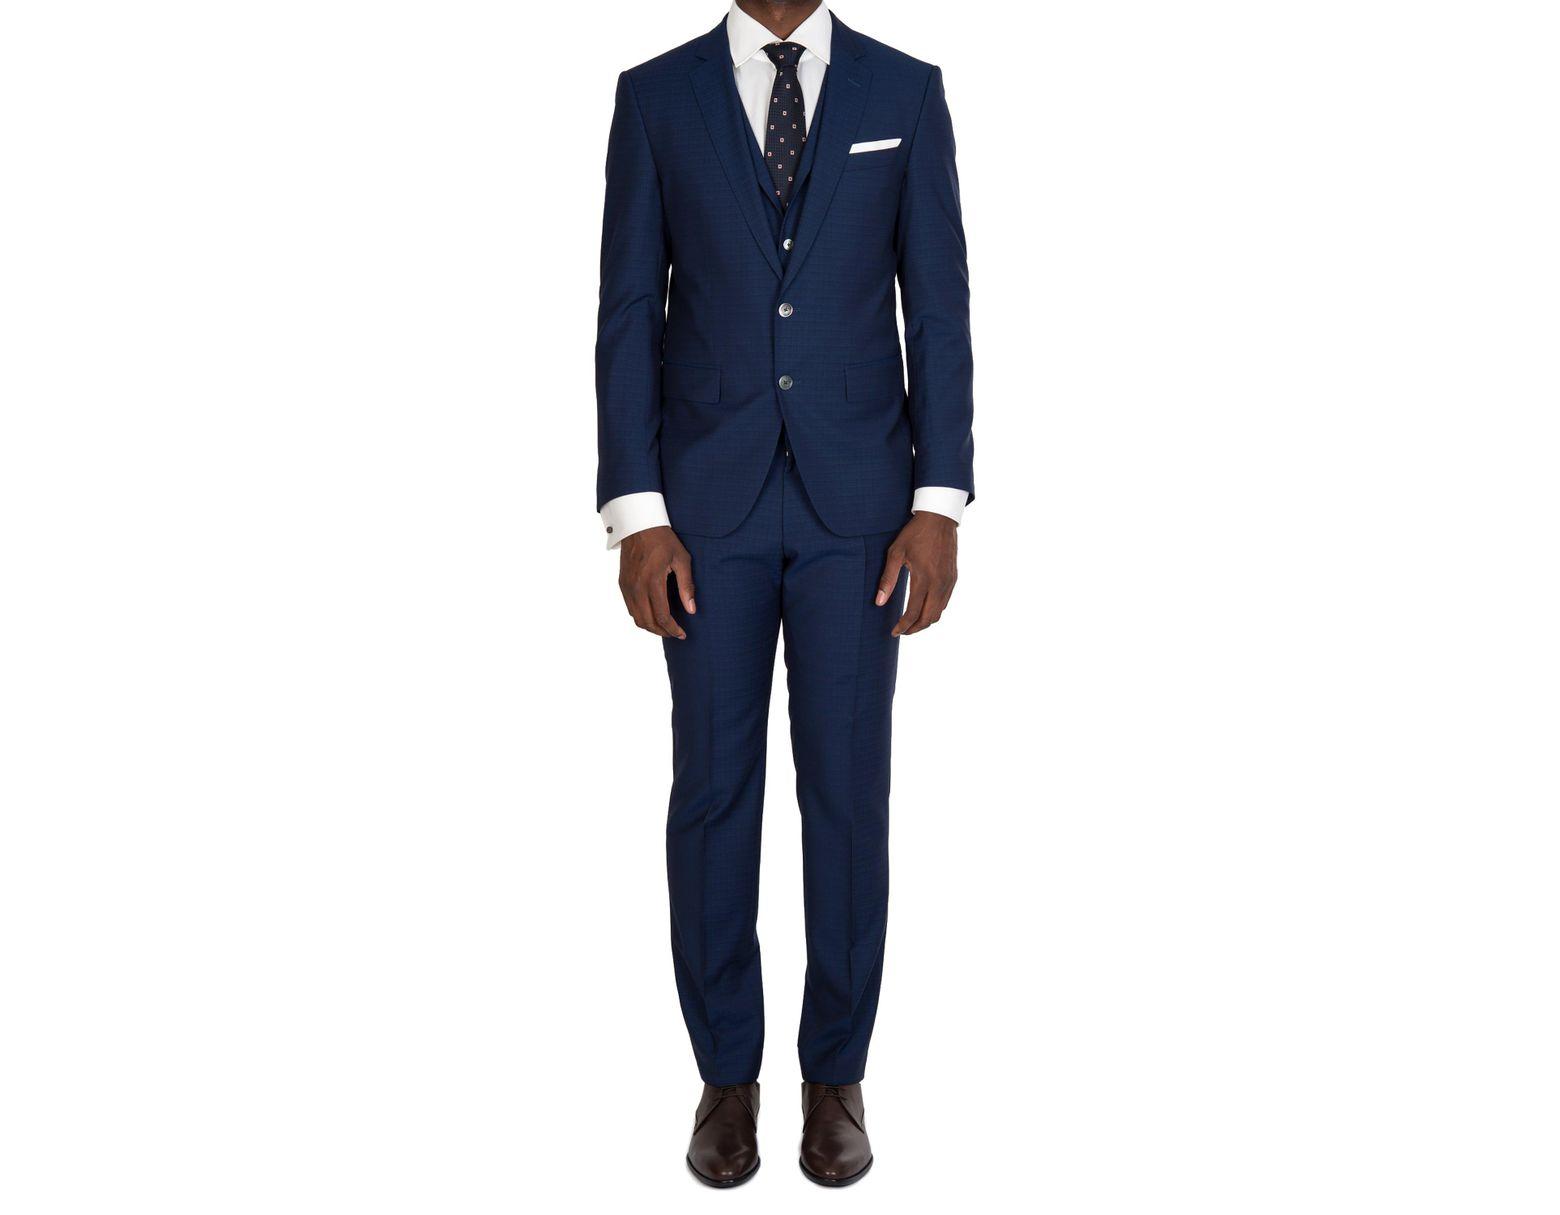 73d2917083c3 BOSS Hugo Hutson5/gander3 We Suit Navy in Blue for Men - Lyst